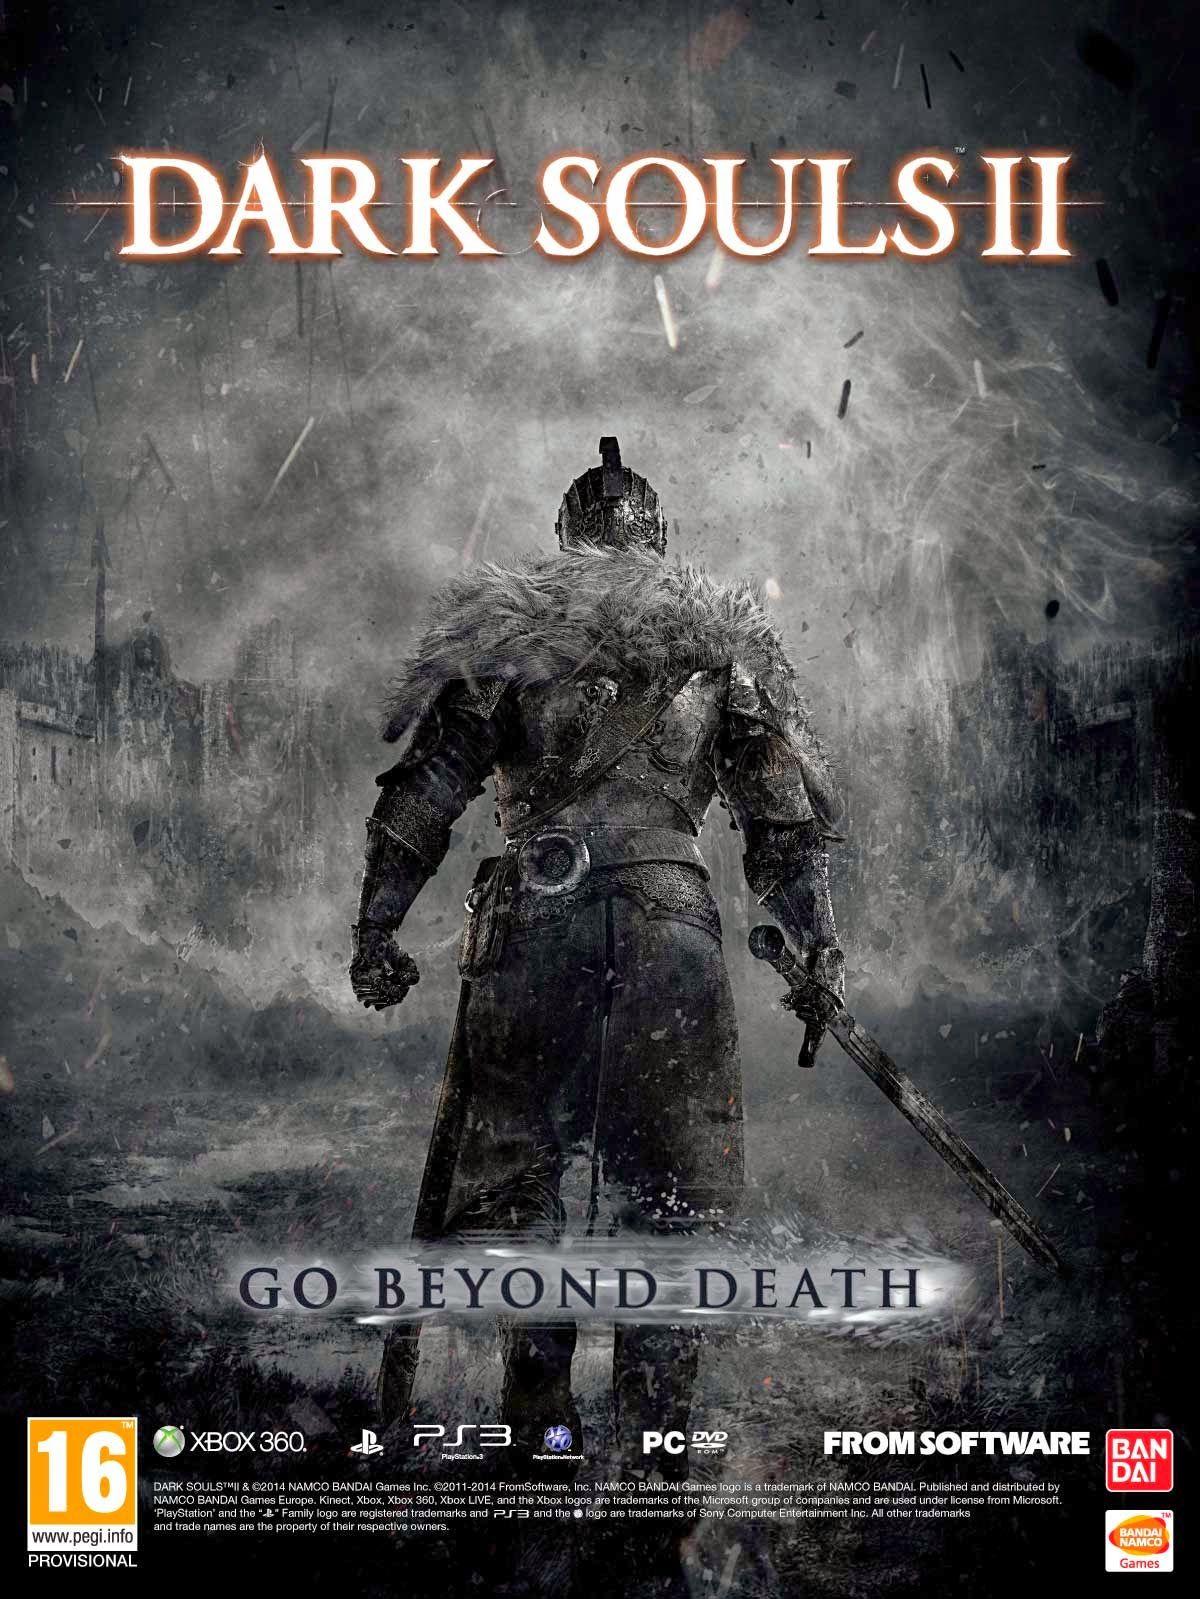 Download Game Pc Dark Souls 2 Full Version Acep Game Download